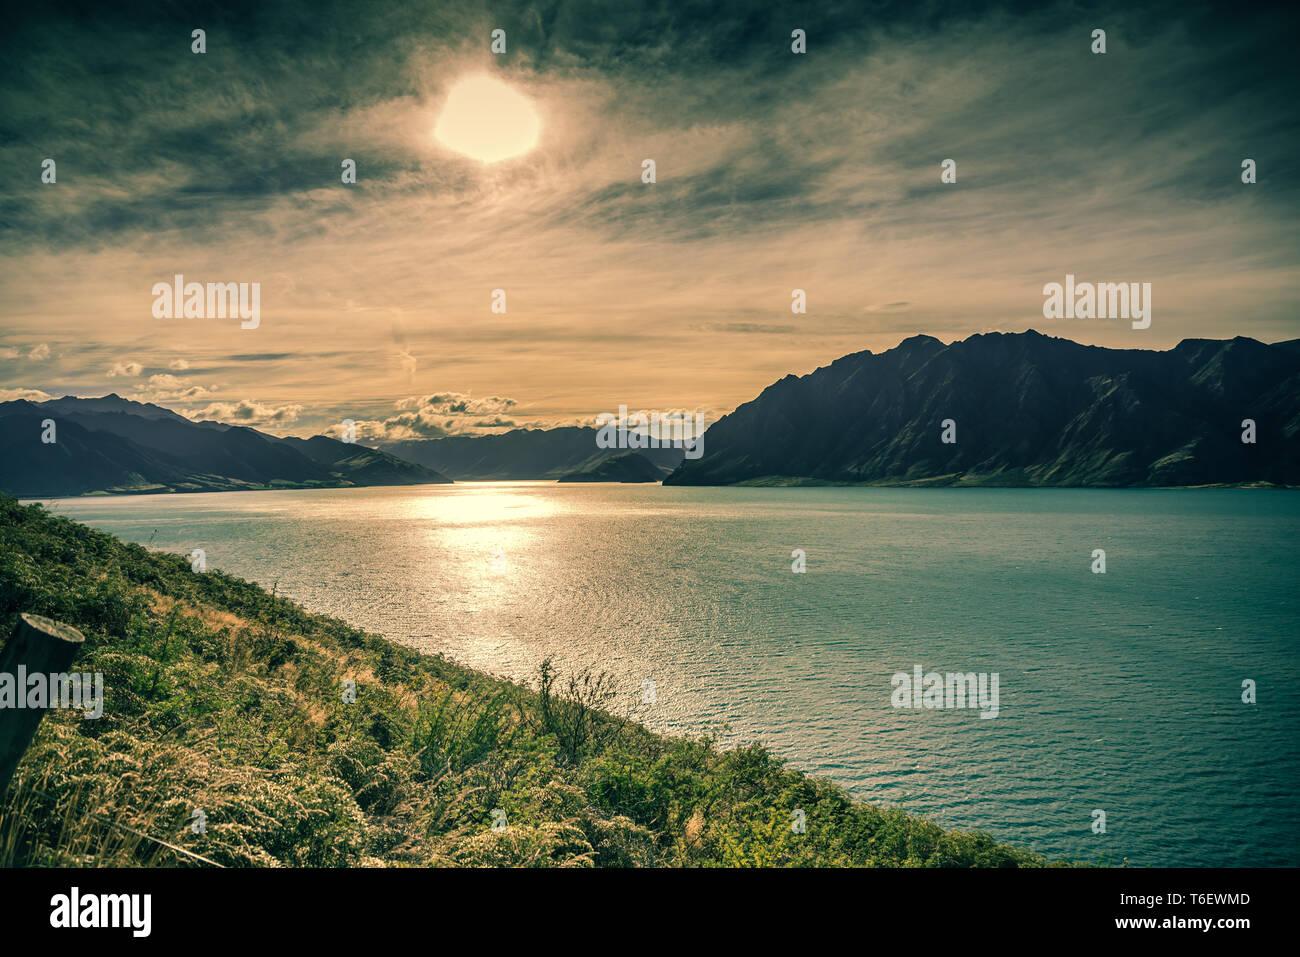 Lake Wanaka, Südinsel, Neuseeland Stockfoto